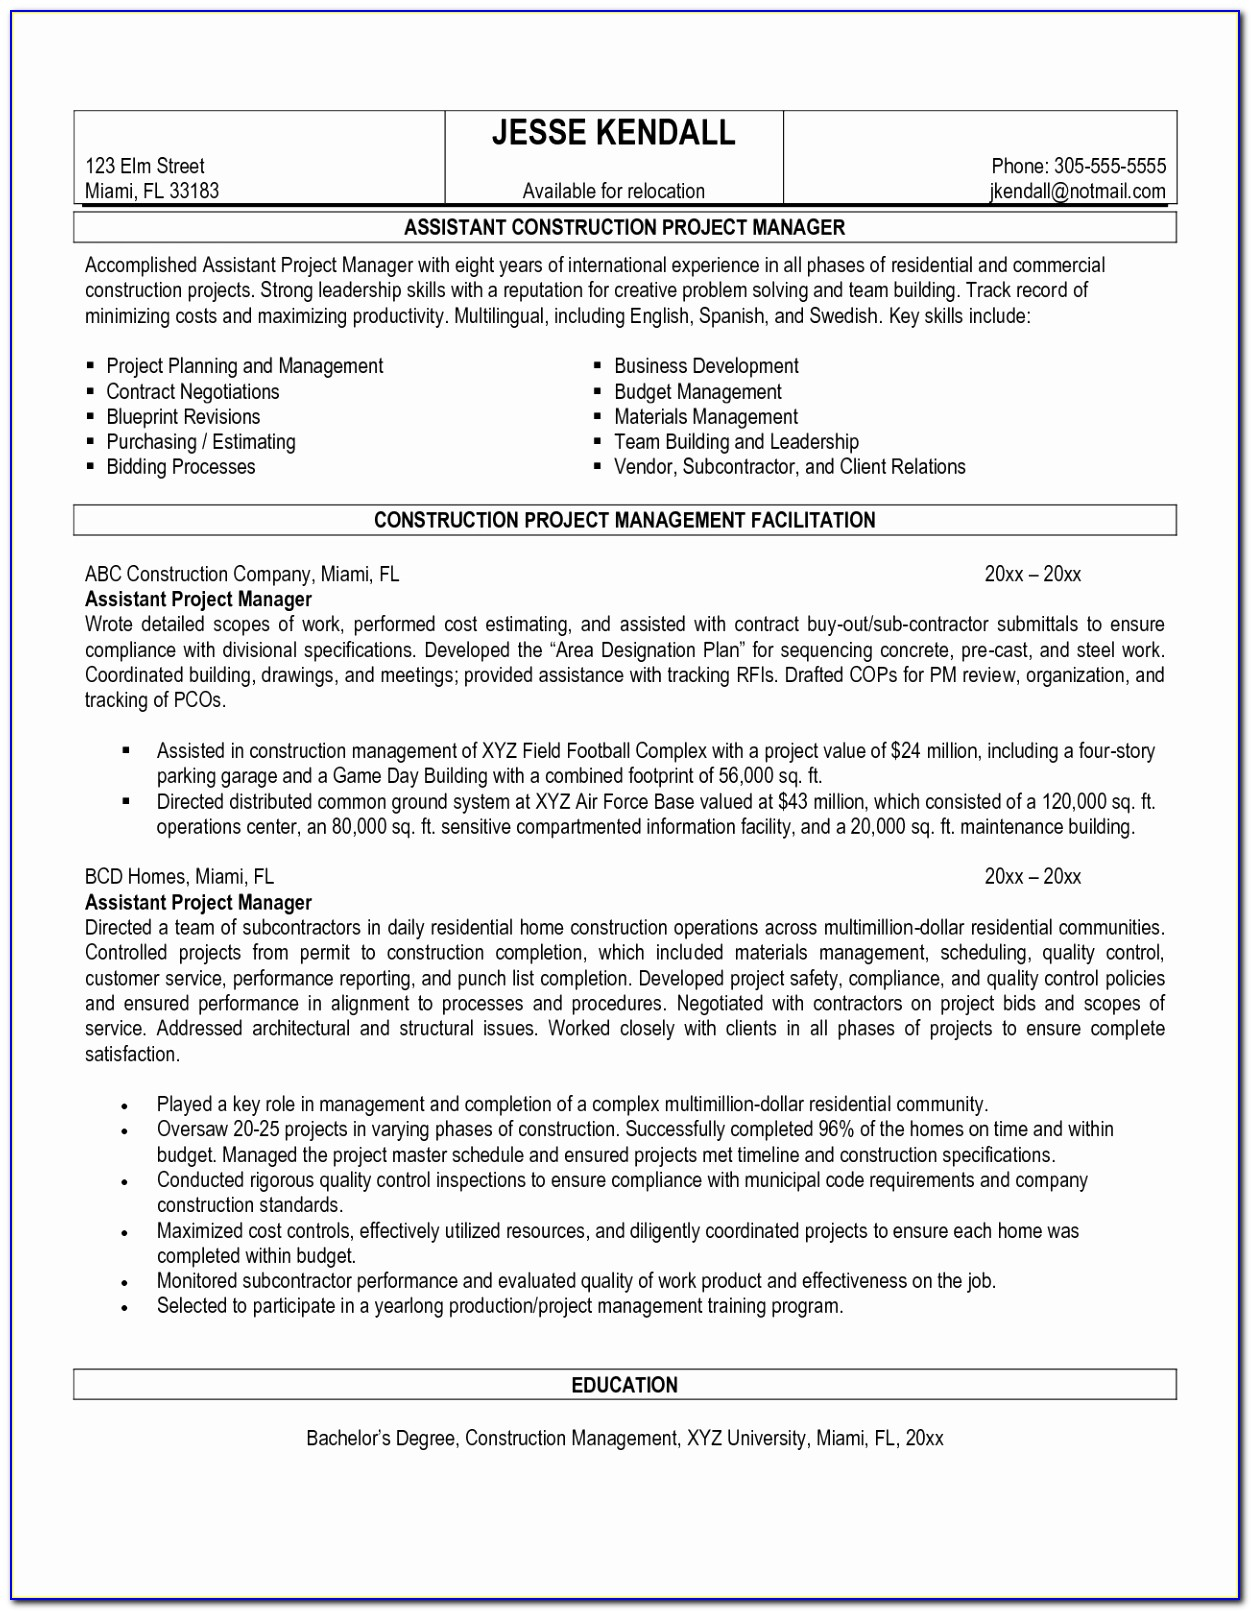 Florida Designation Of Health Care Surrogate Form Free Awesome 57 Fresh Gallery Florida Health Care Surrogate Form